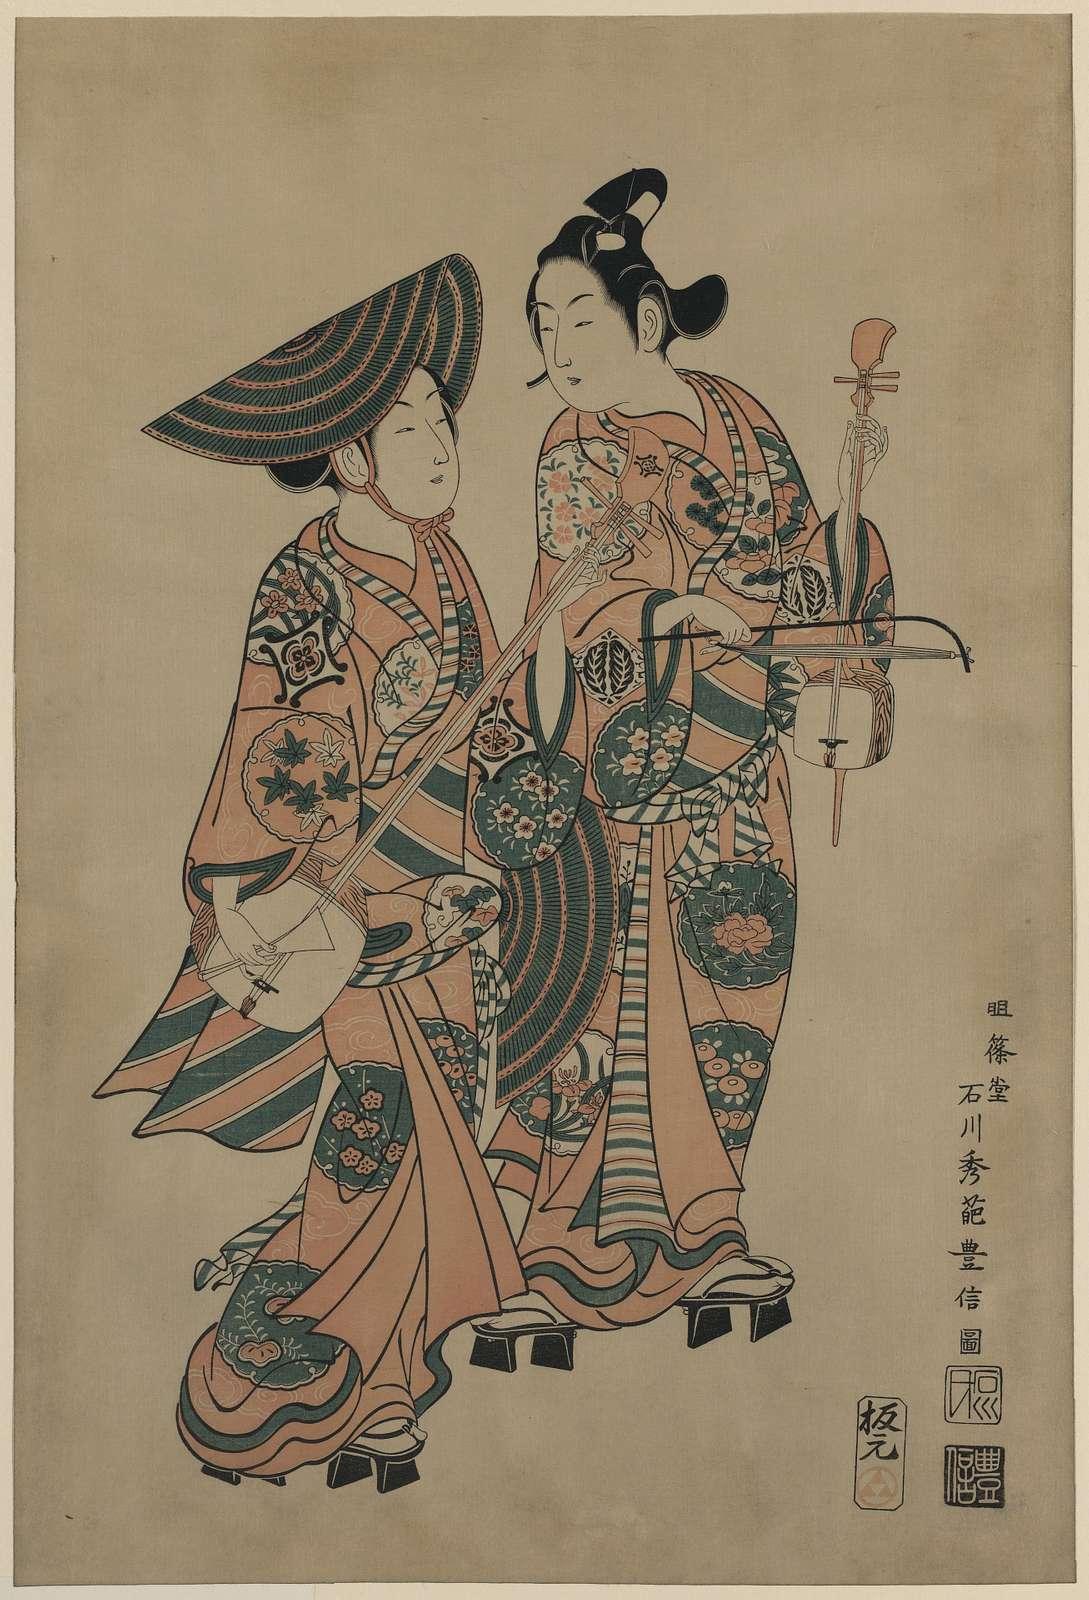 Onoe kikugorō [to] nakamura kiyosaburō